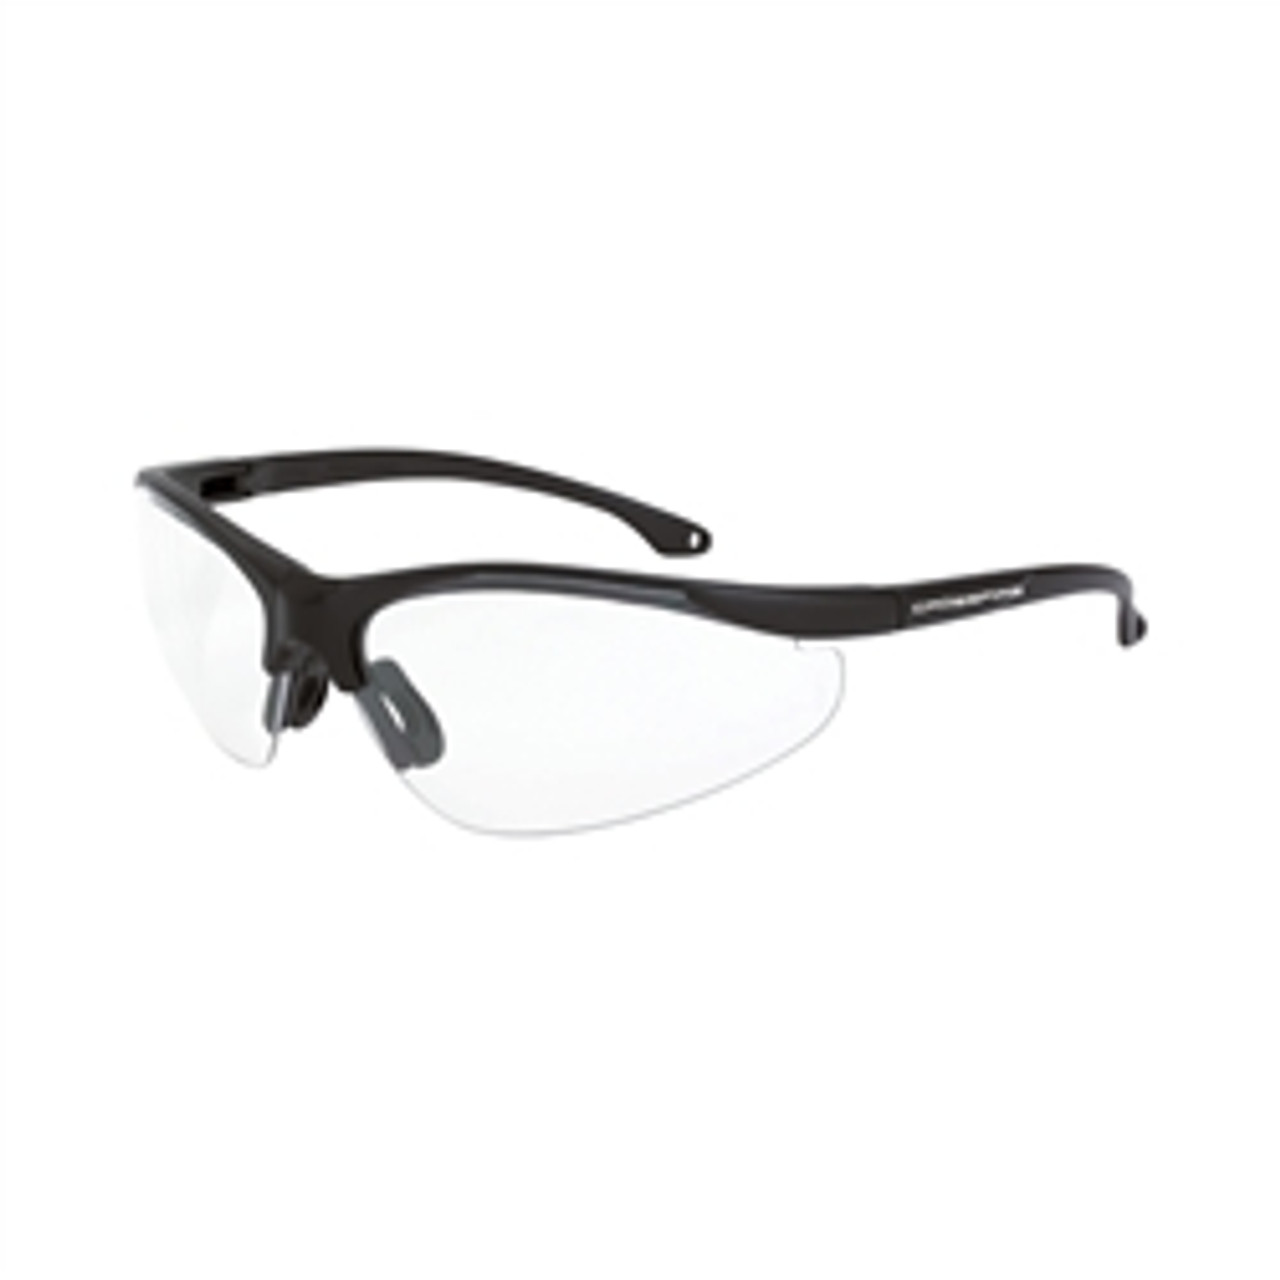 Crossfire Brigade Performance Safety Eyewear - Radians 1734